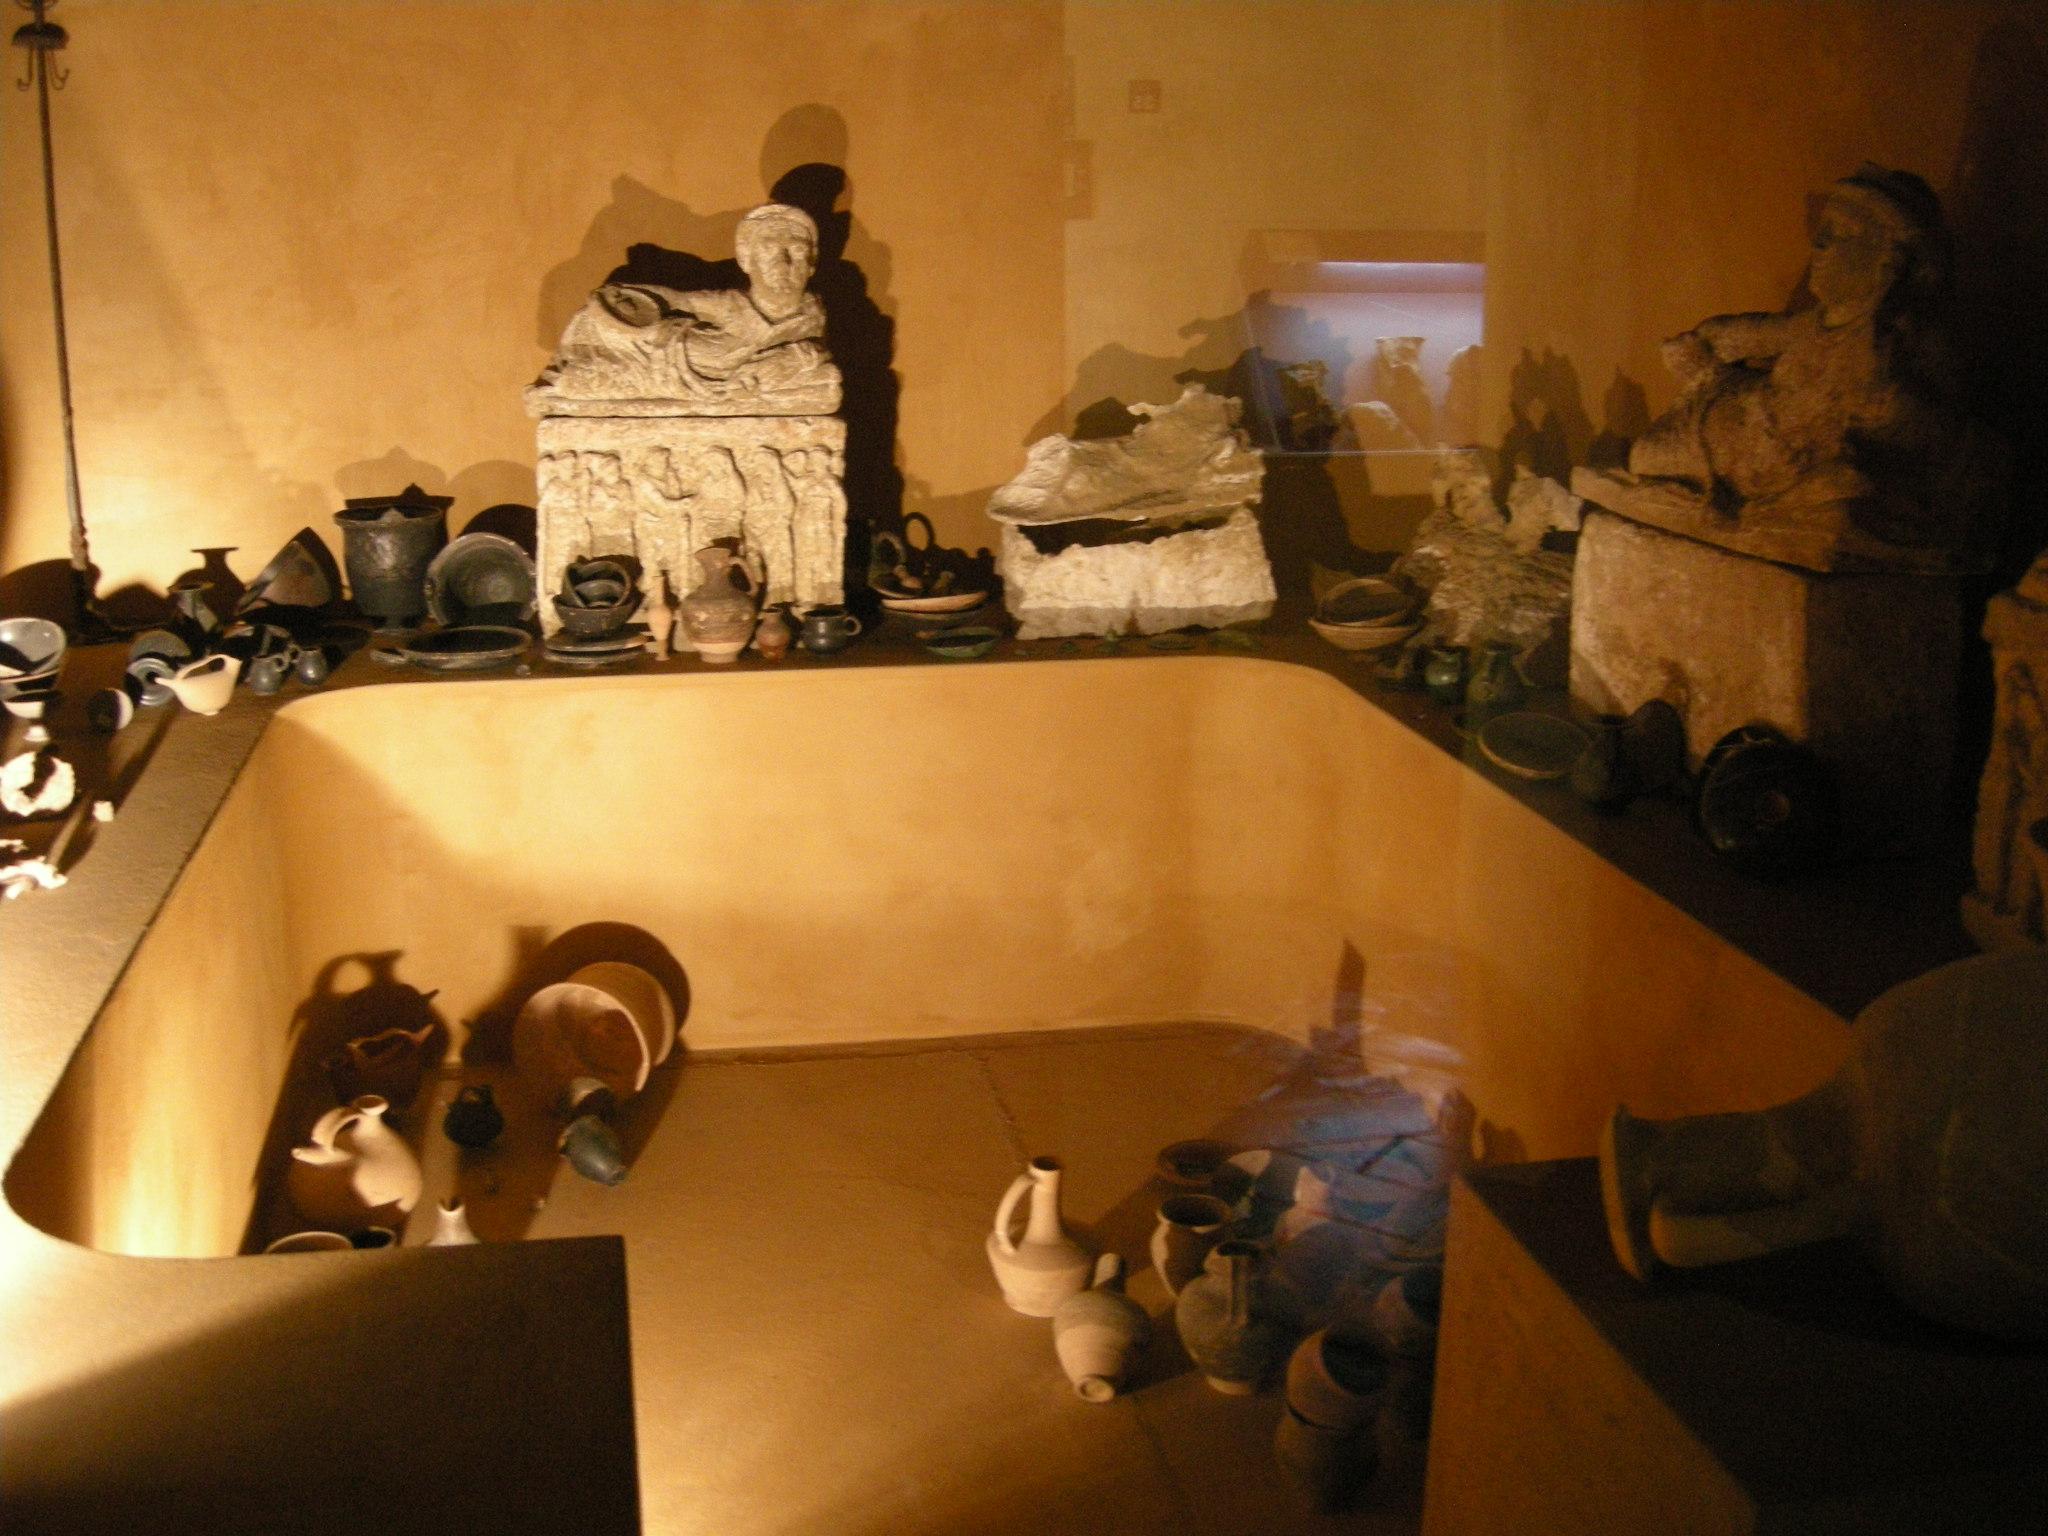 Museo_guarnacci,_ricostruzione_di_tomba_etrusca